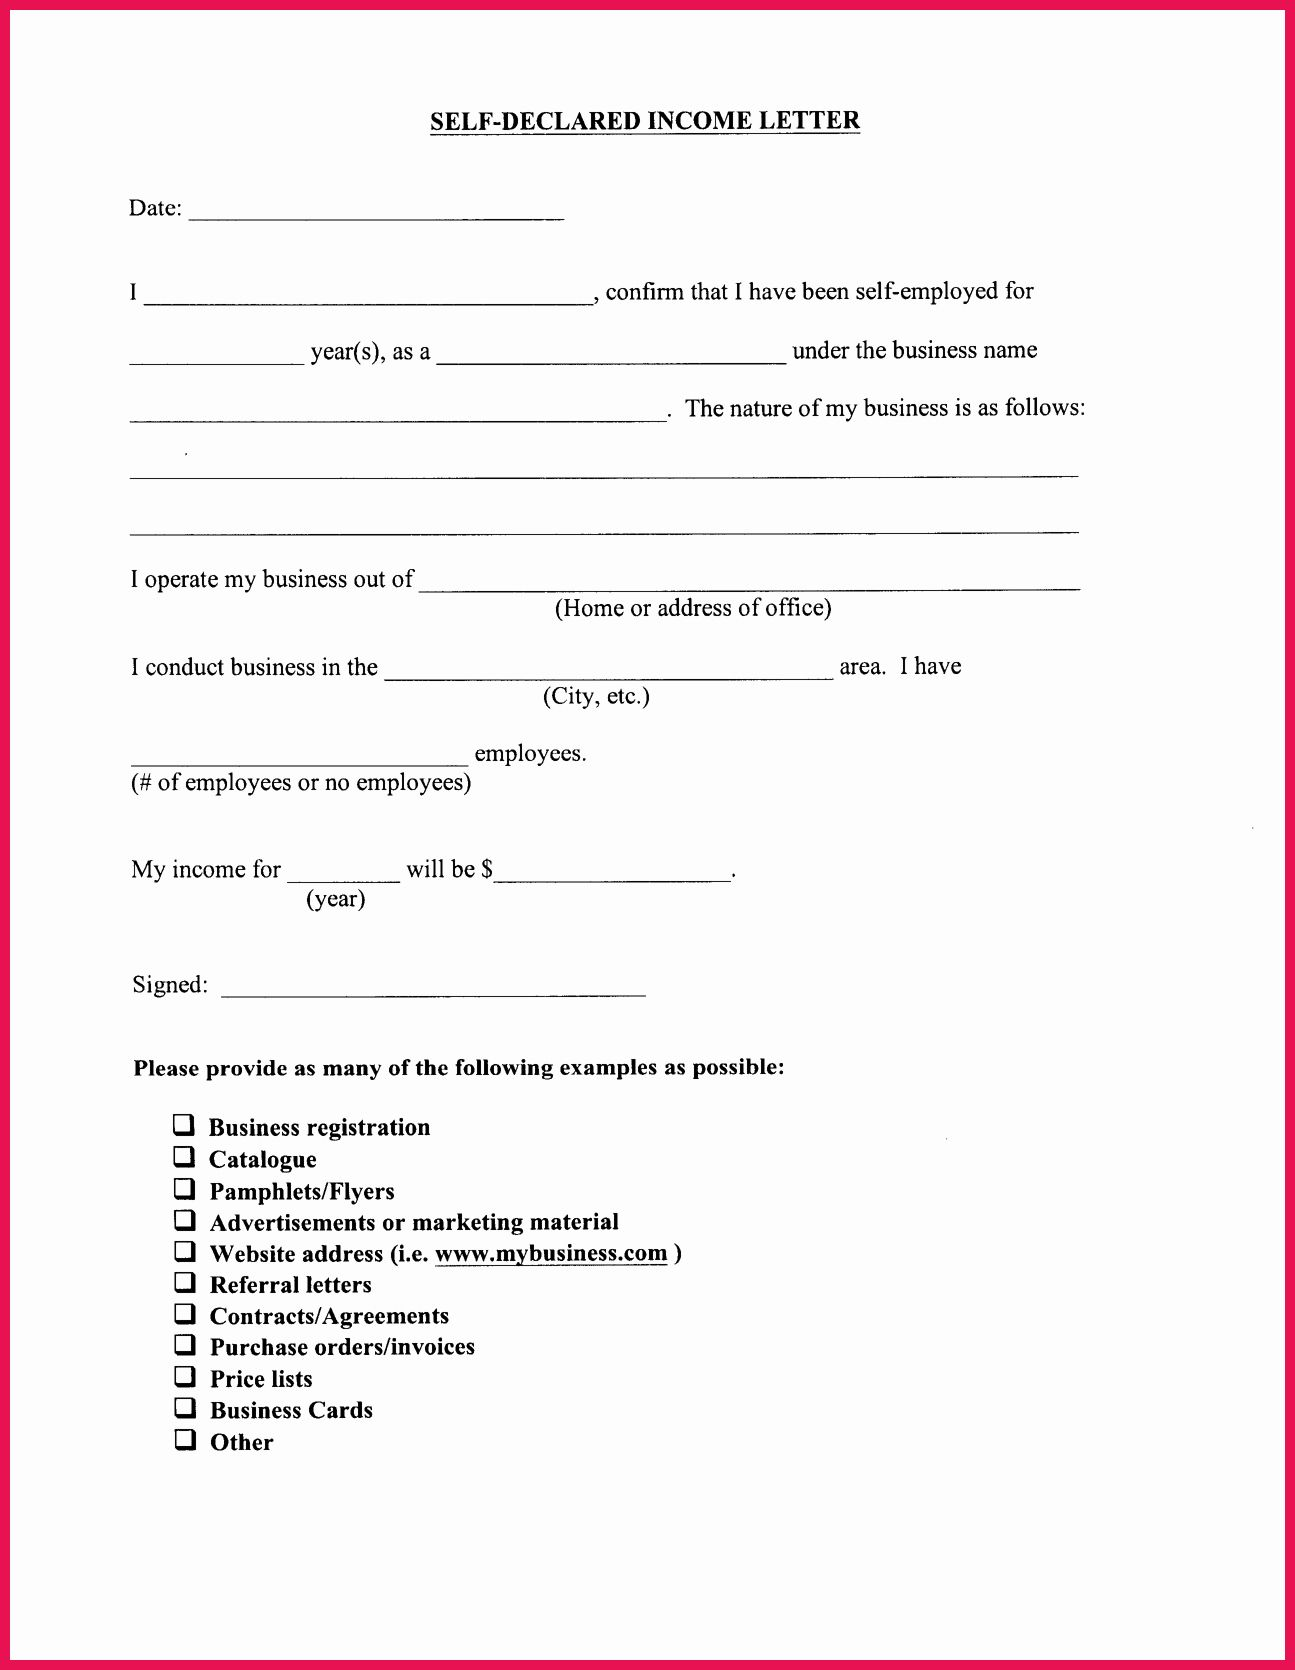 self employment statement template inspirational entry level social worker resume best summary for preschool teacher examples